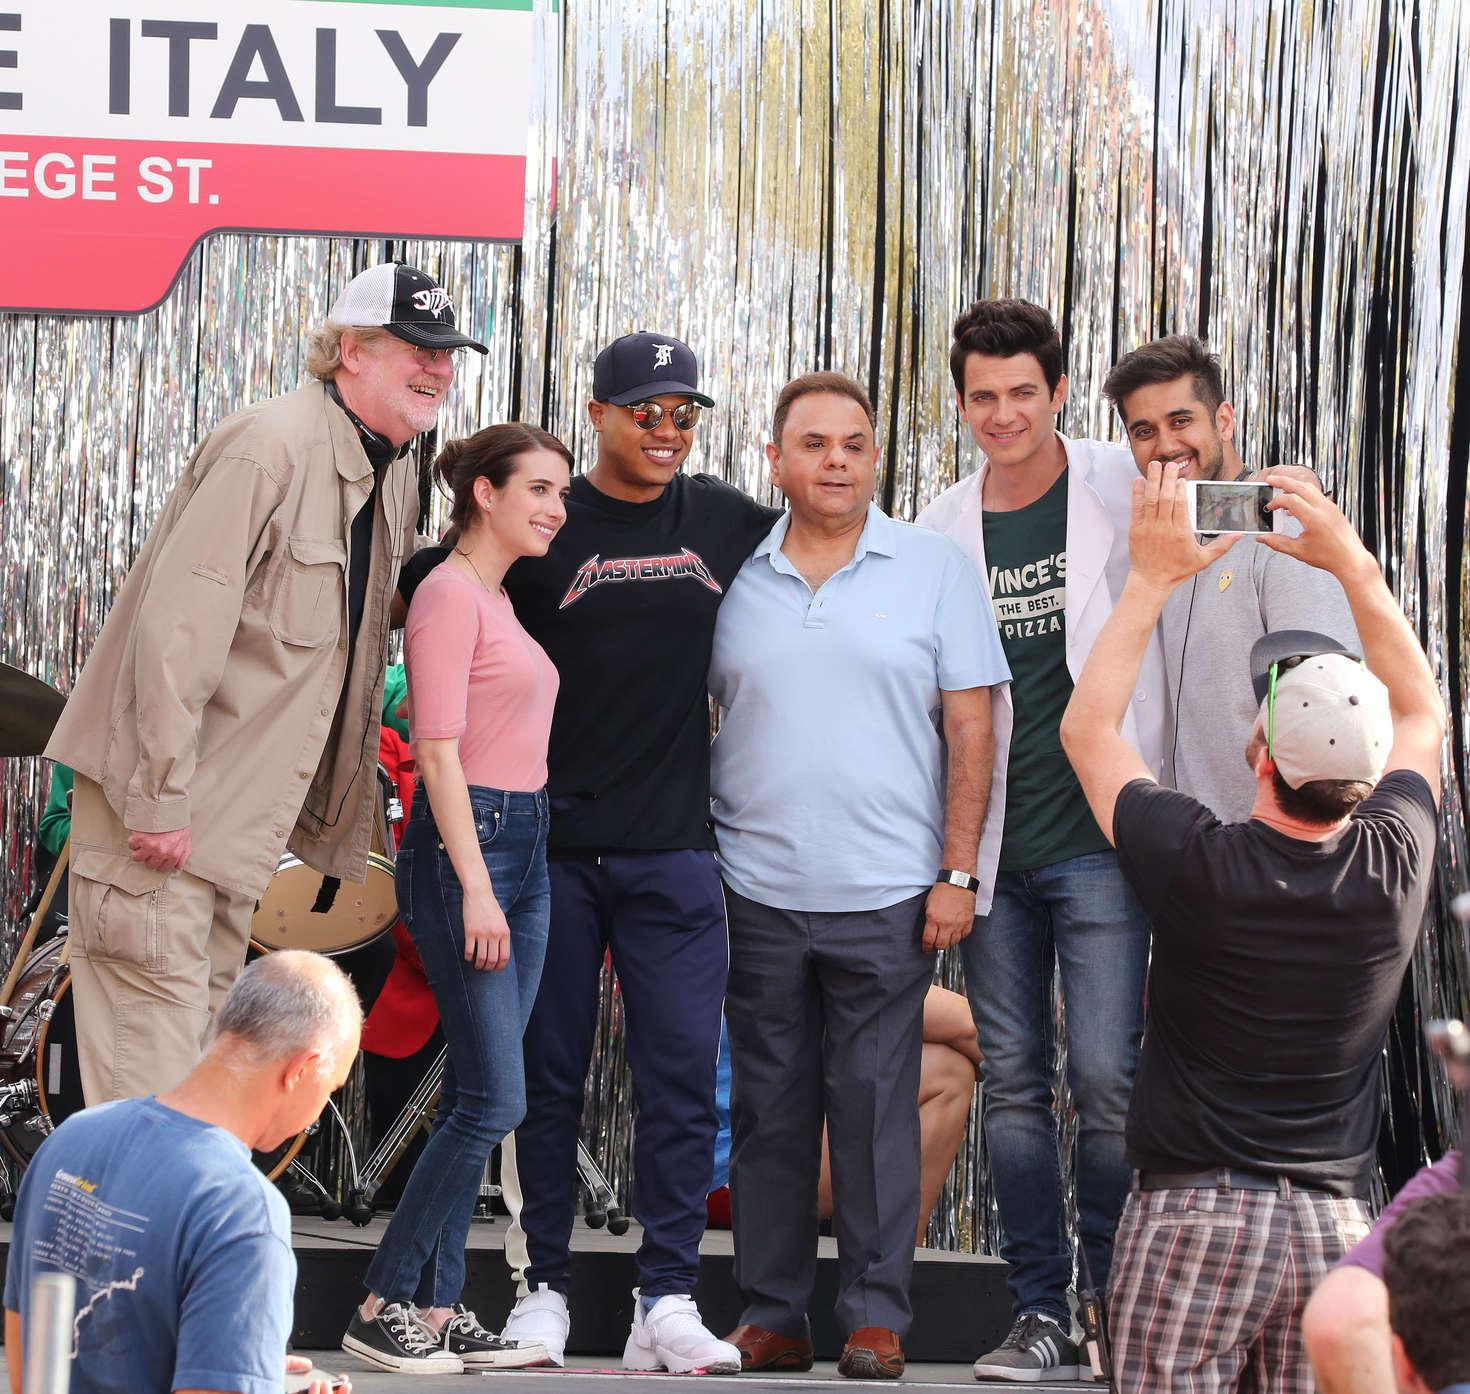 Emma Roberts 2017 : Emma Roberts on the set of Little Italy -13